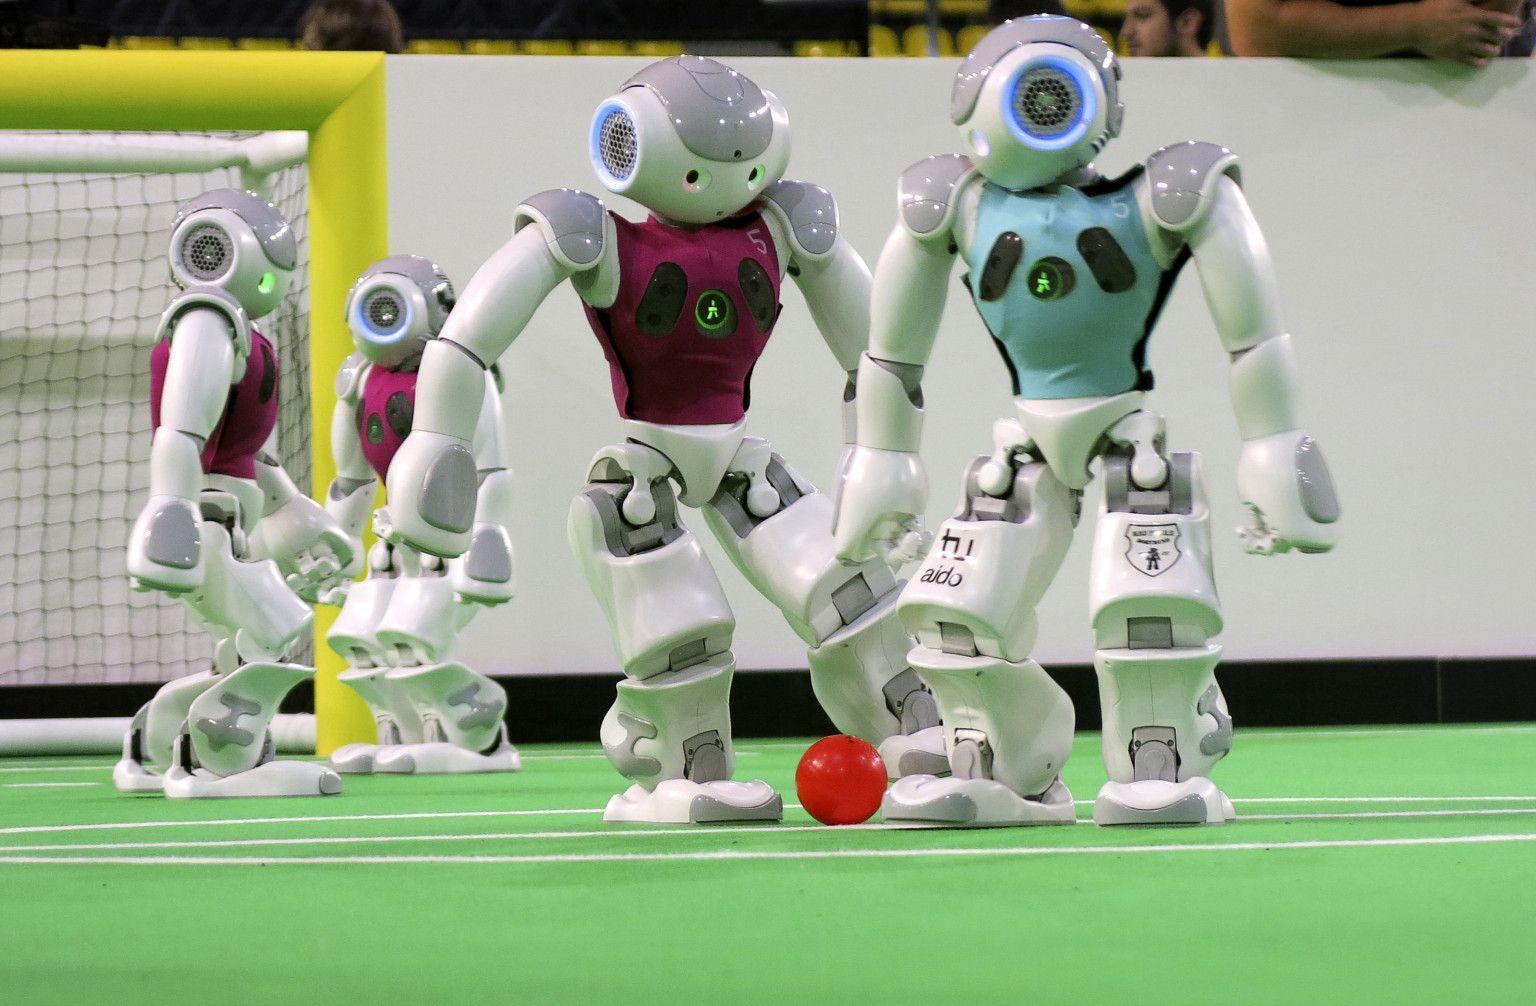 RobotCup: la coppa del mondo di calcio robotico